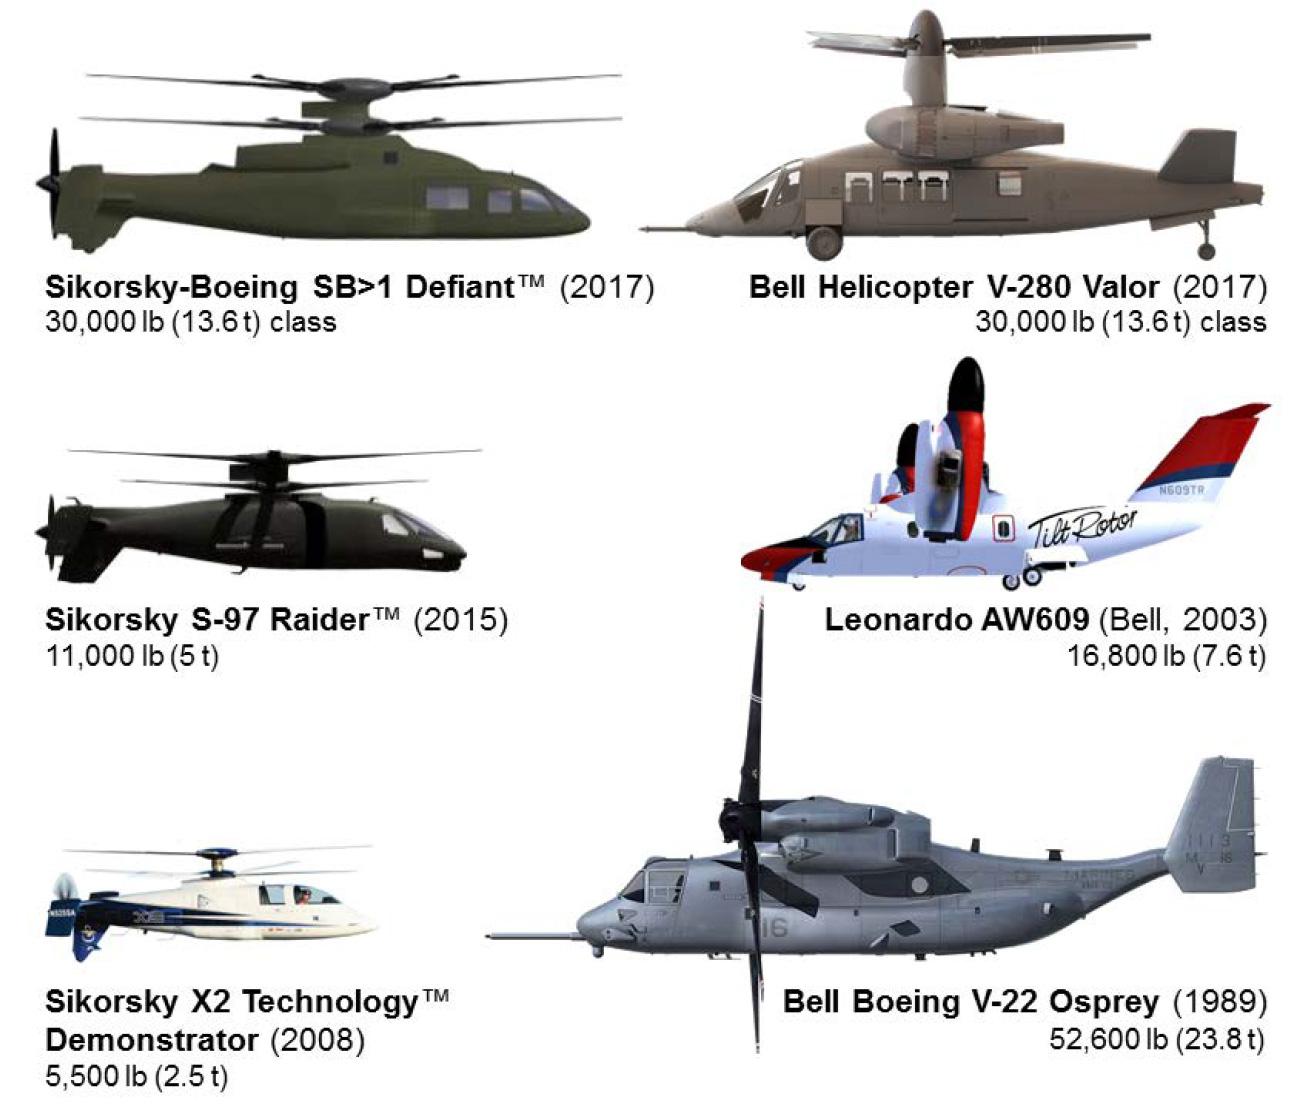 VTOL Comparisons